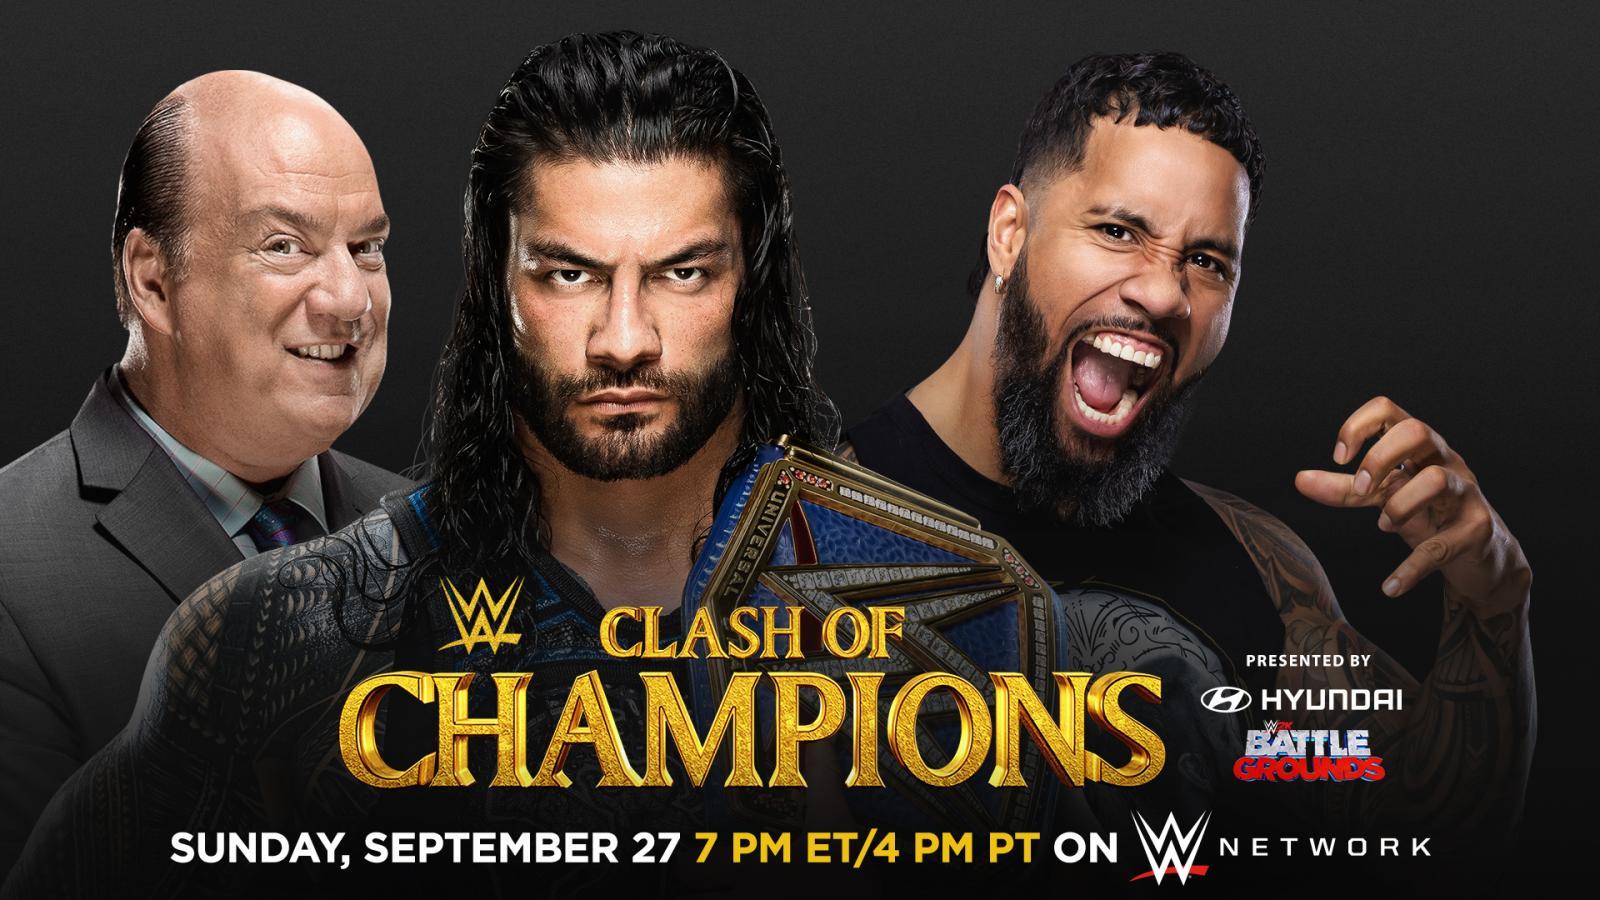 ¿Porqué Roman Reigns se enfrenta a Jey Uso en Clash Of Champions?